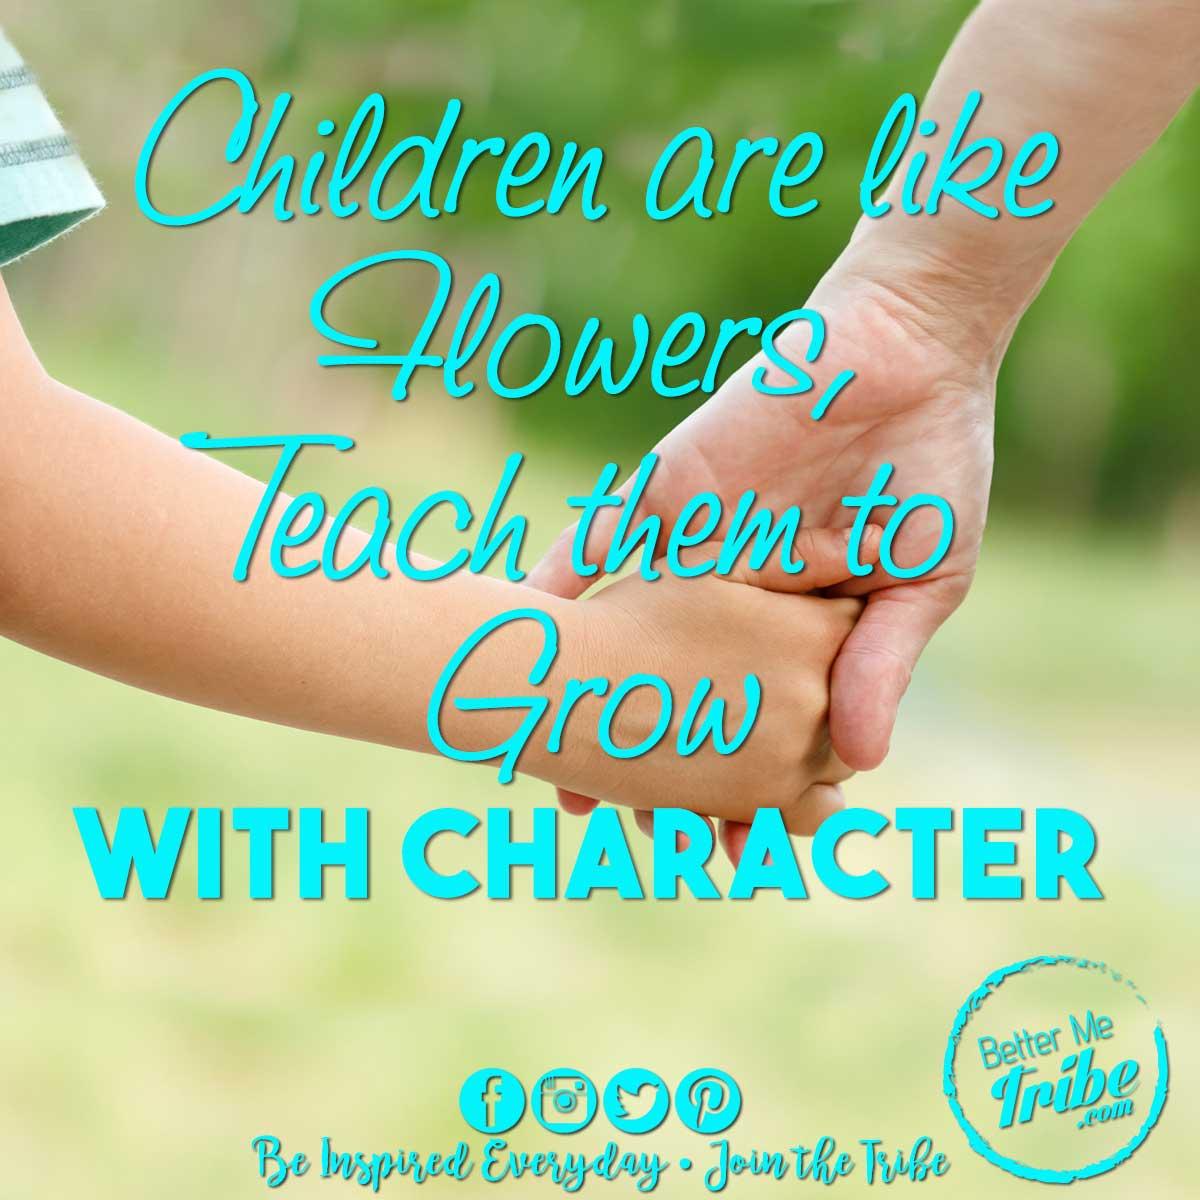 ChildrenAreLikeFlowers-web